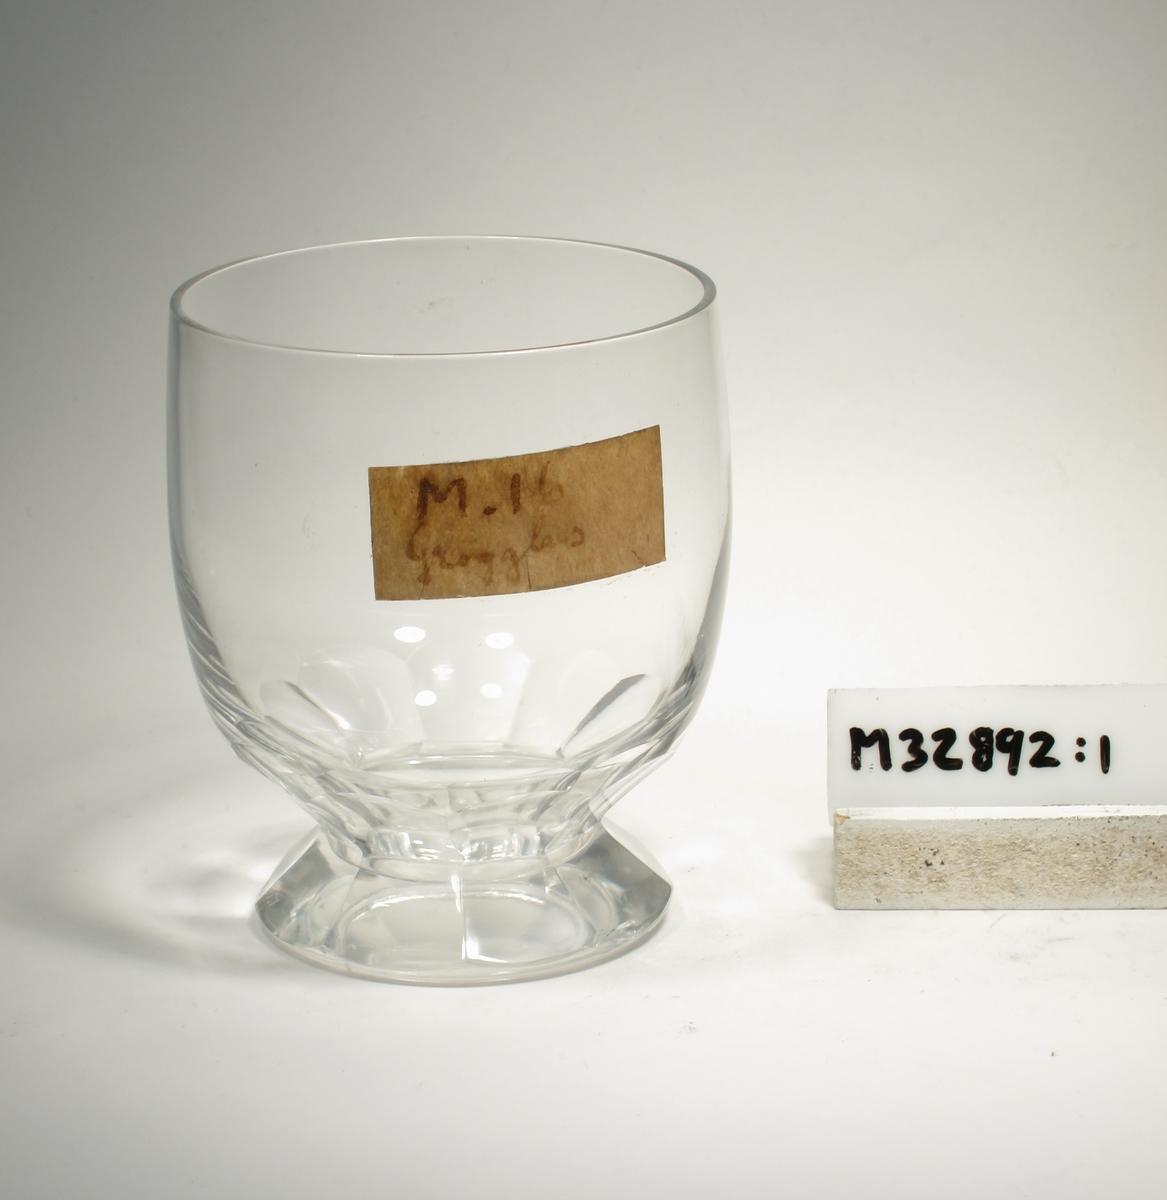 "Svagt elliptisk kupa på konisk klack. Glaset är facettslipad i 9 bågar. Lapp: ""M.16 Grogglas"""